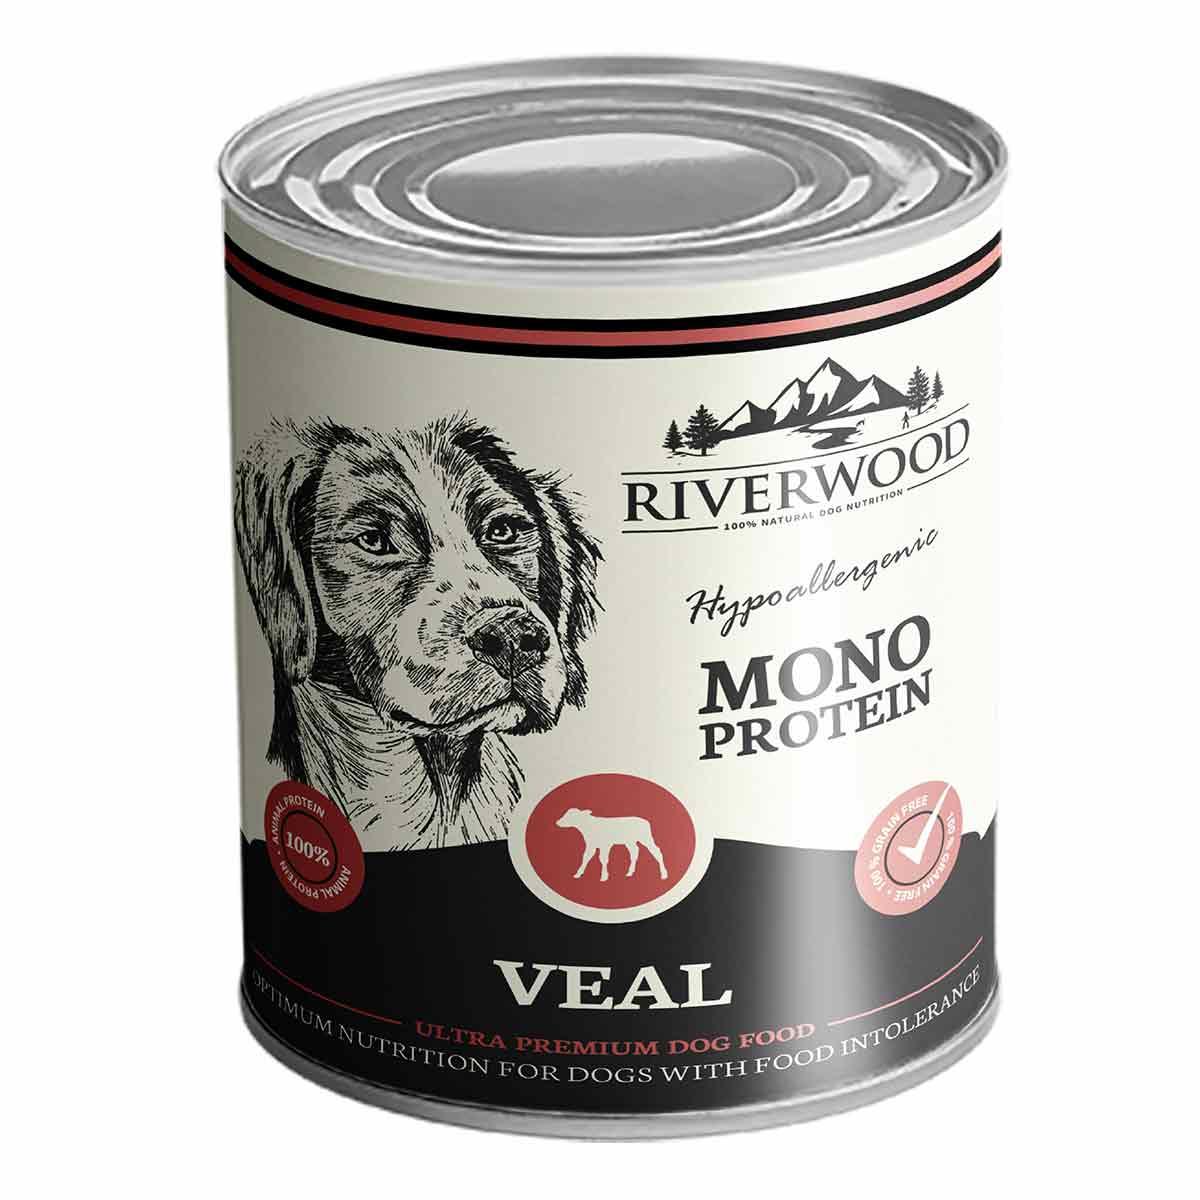 Mono Proteïne Veal